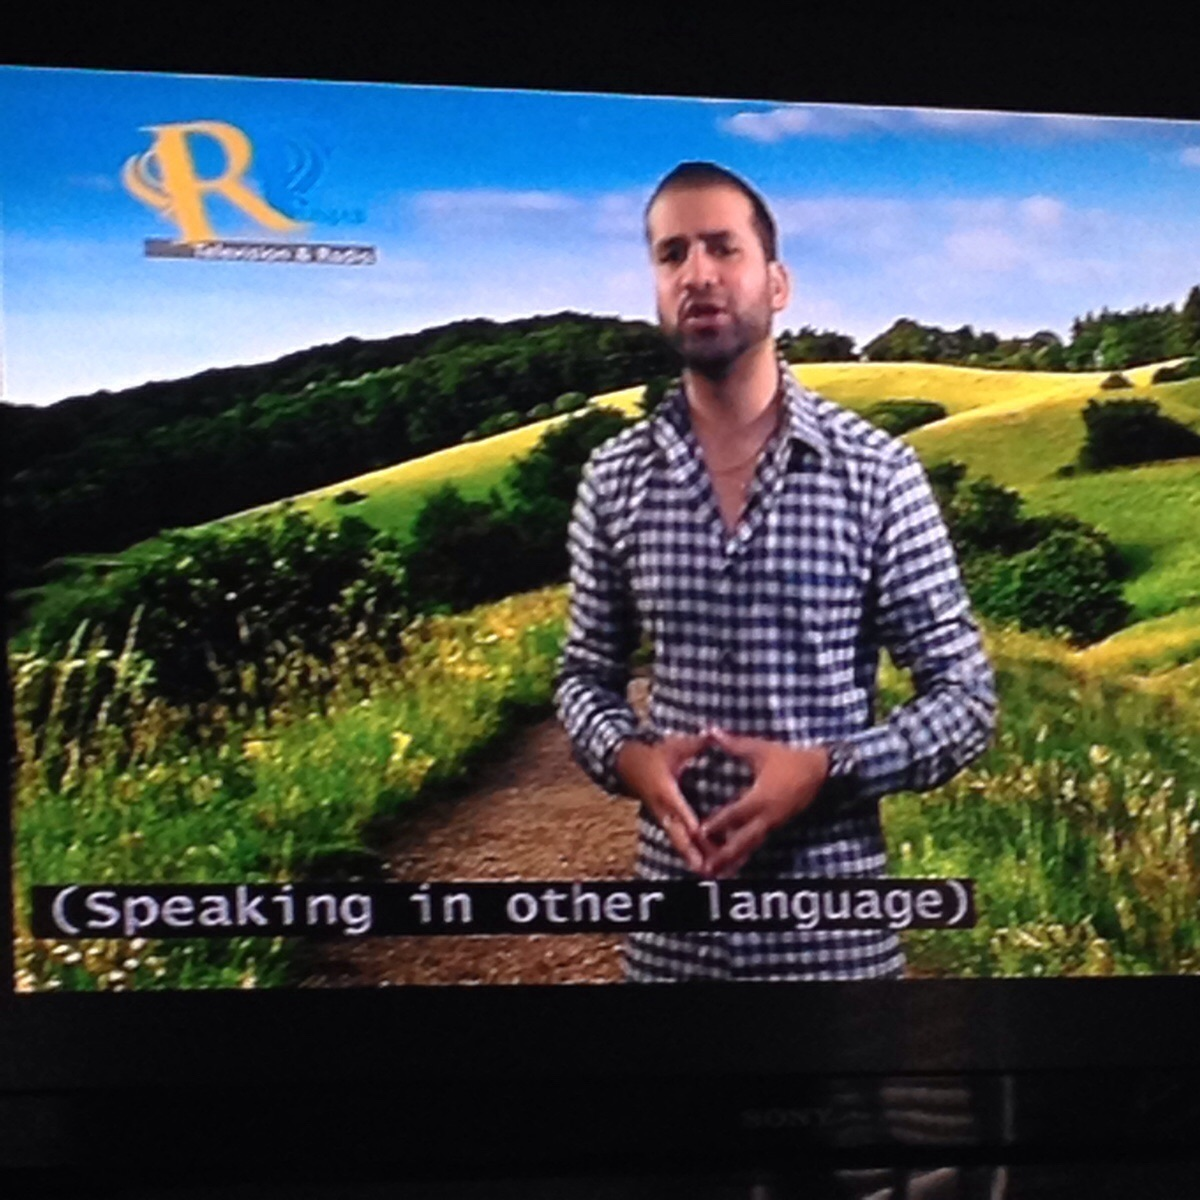 Thanks subtitles